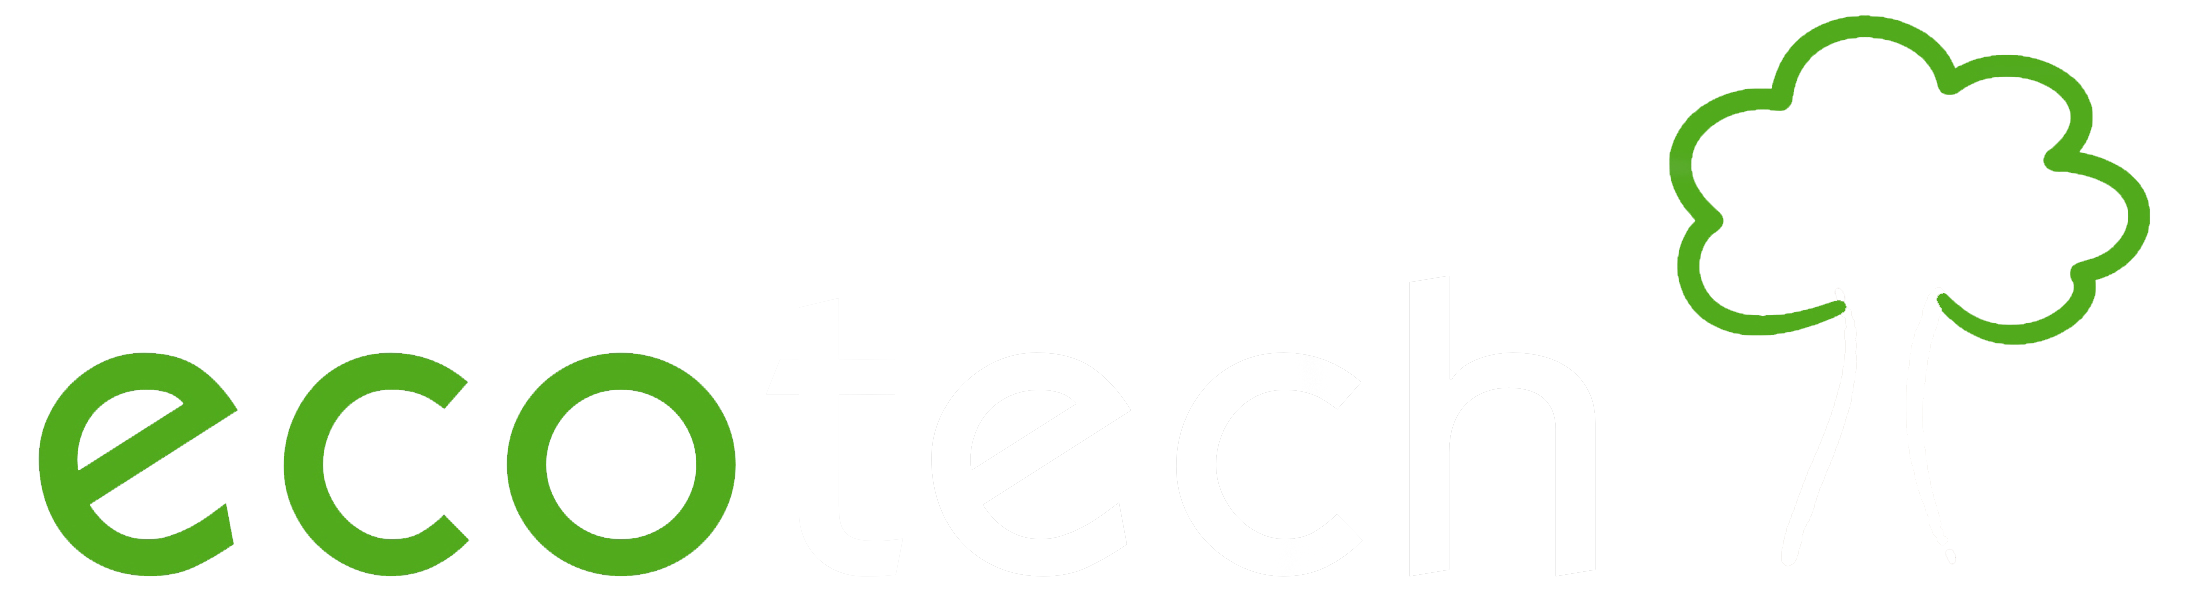 Ecotech Alquiler de tecnologia